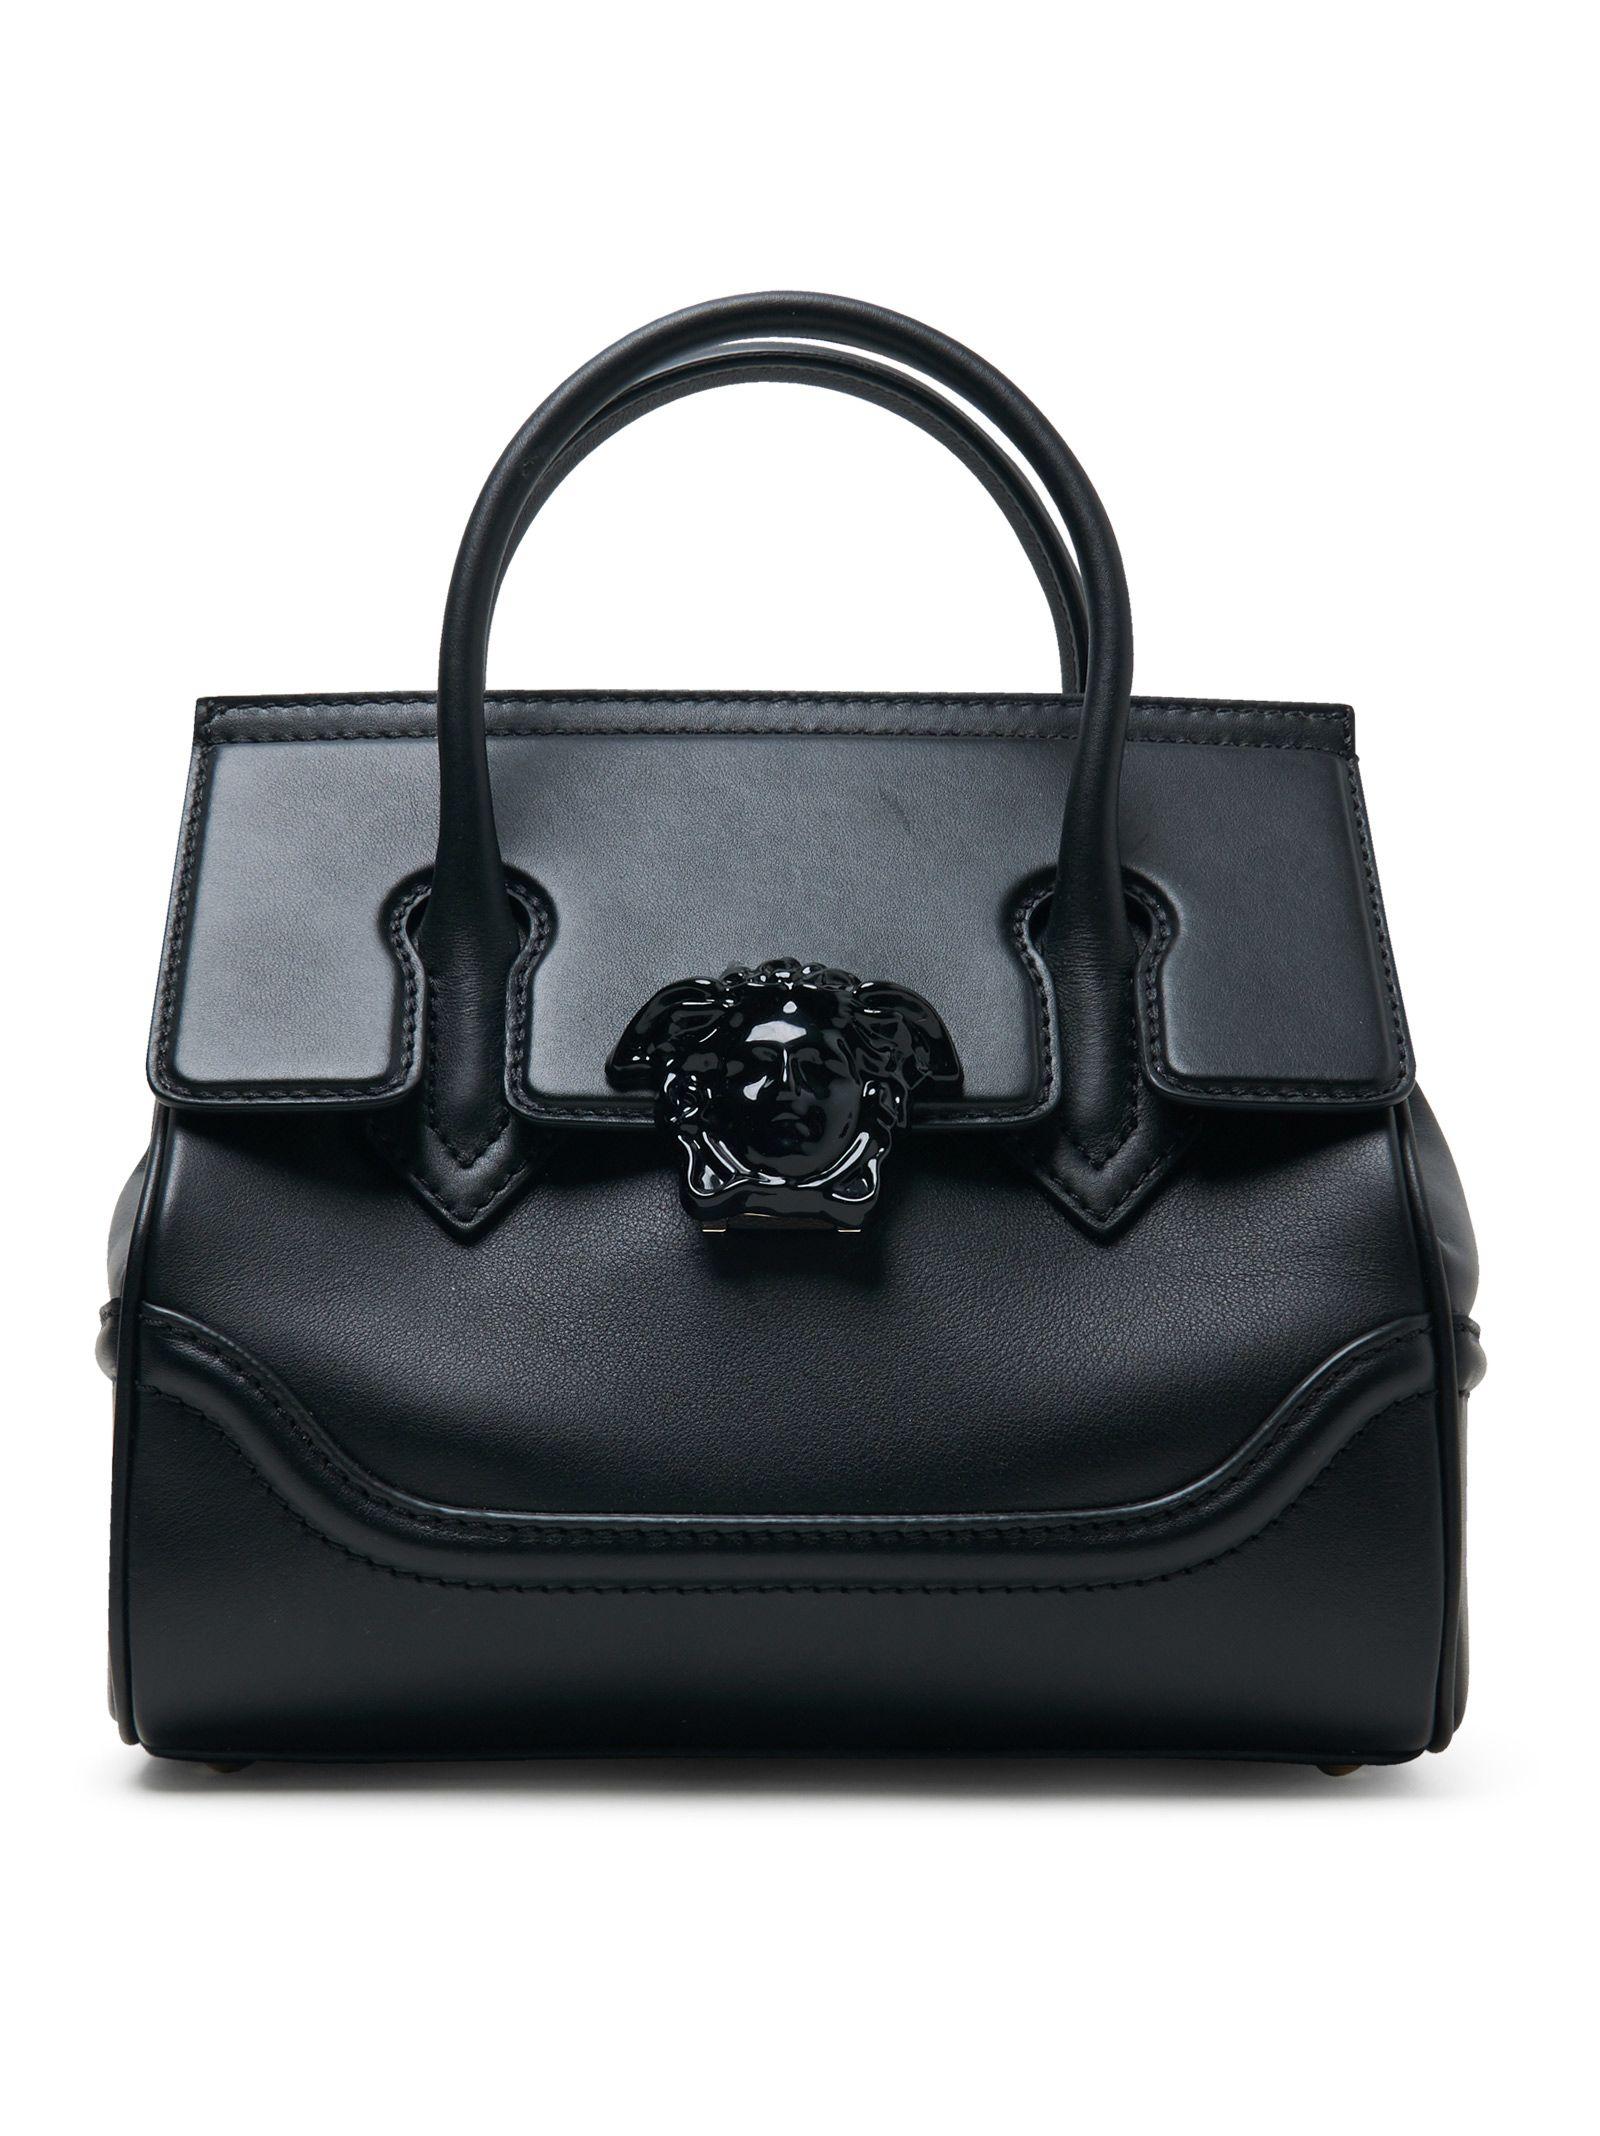 Versace Calf Bag